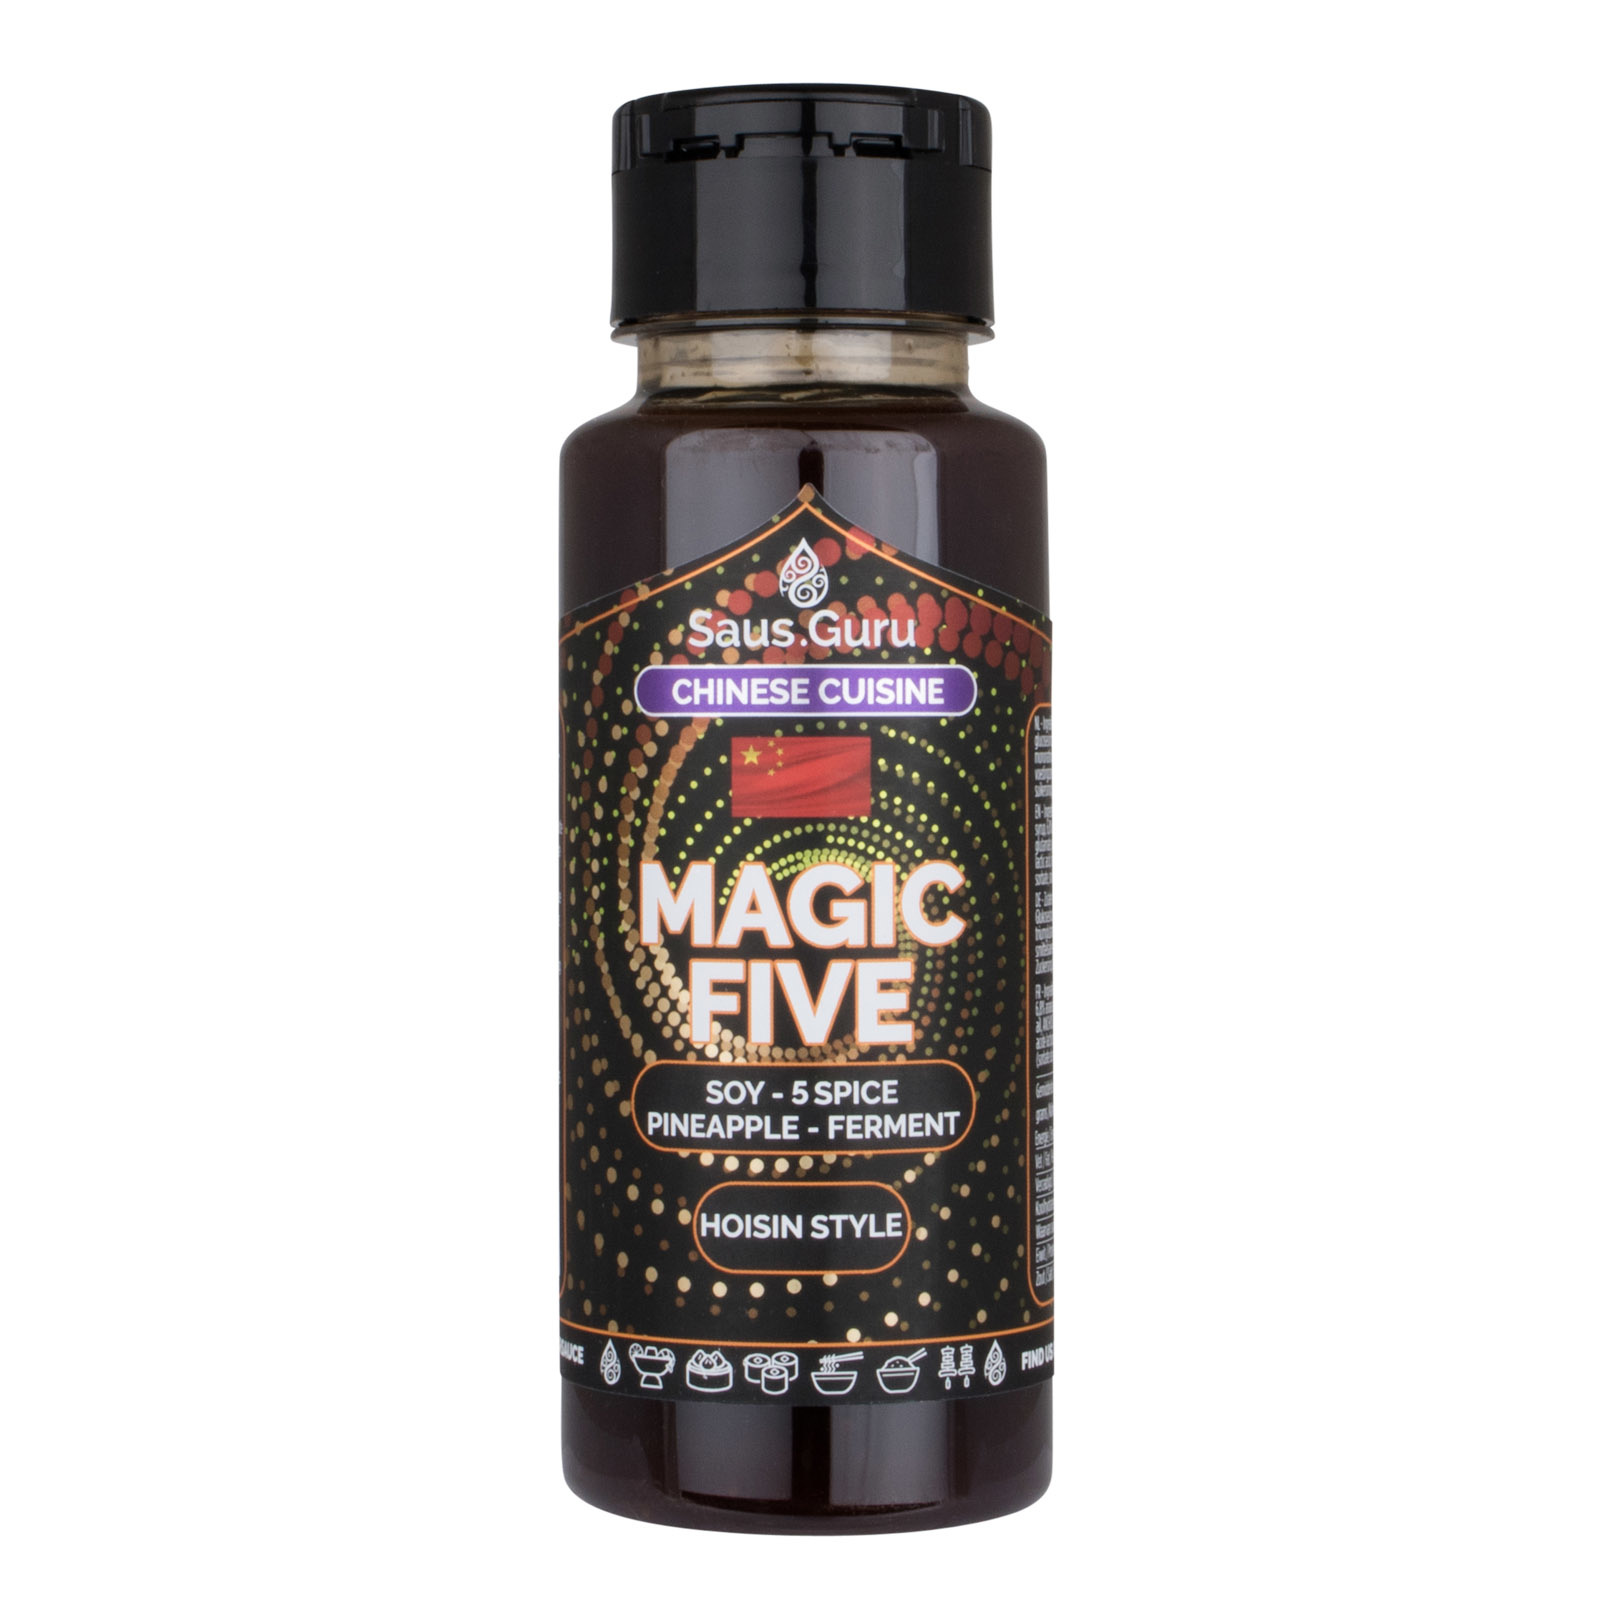 Saus.Guru's Magic Five-1